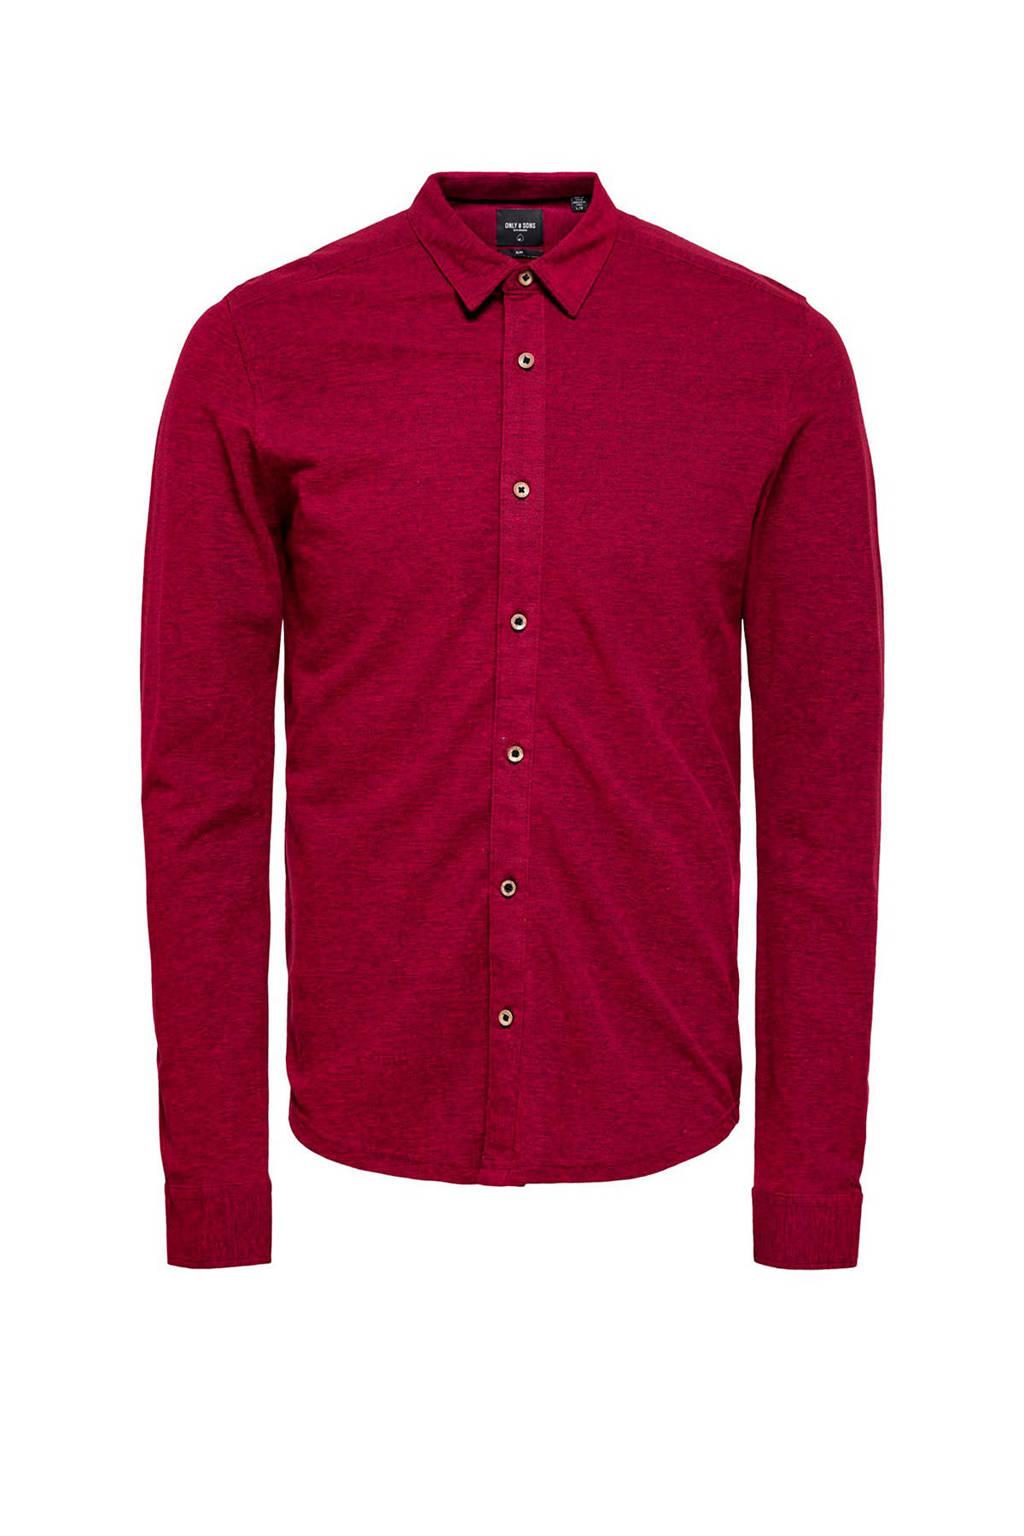 ONLY & SONS gemêleerd regular fit overhemd rood, Rood